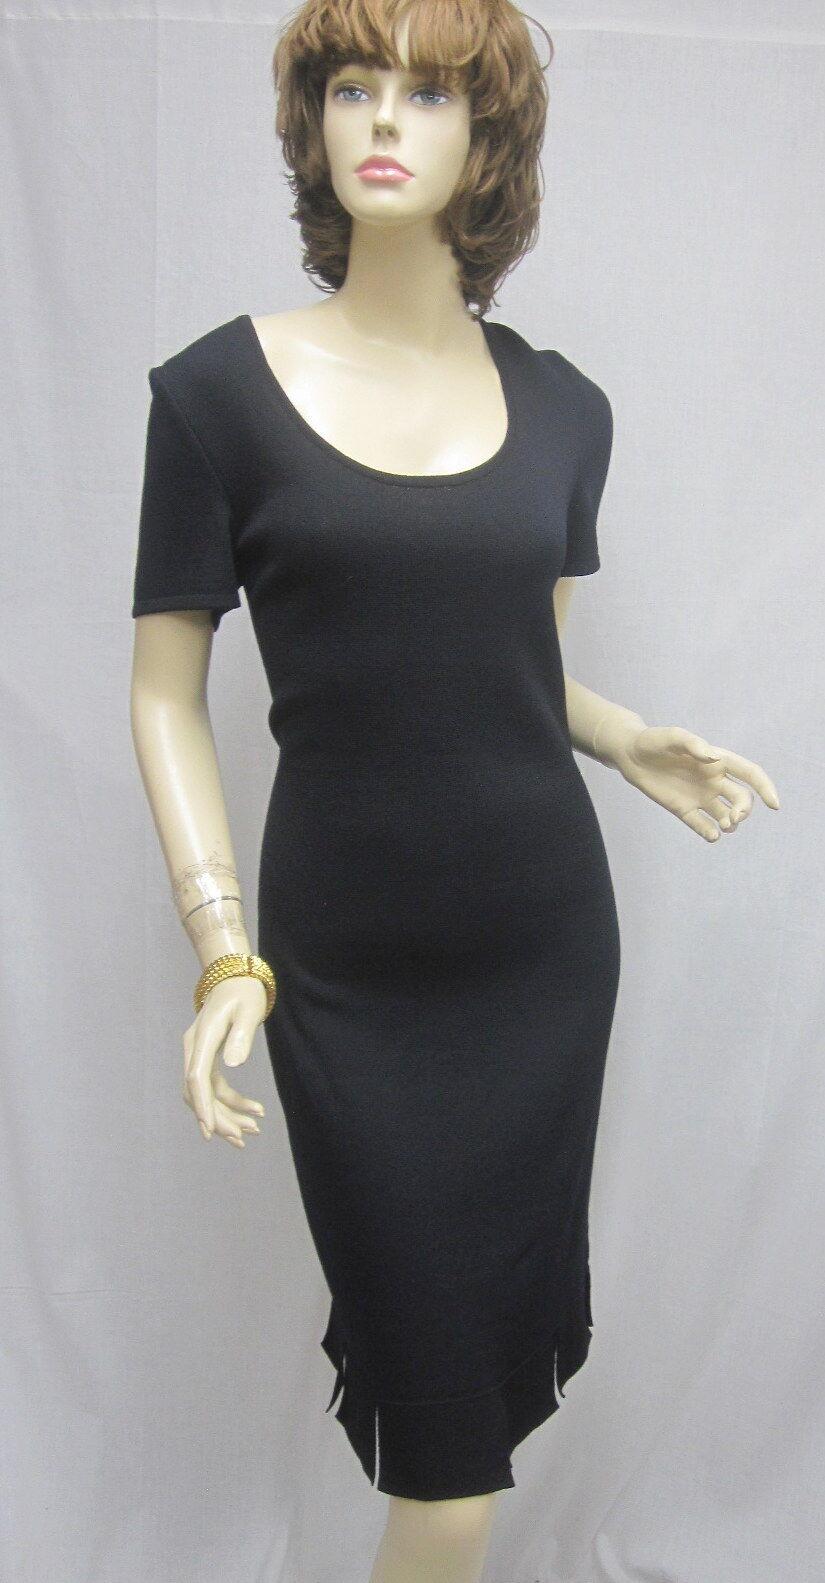 St. John  Knit Colección NWOT Vestido Negro Con Abertura Talla 8 Único  Venta barata